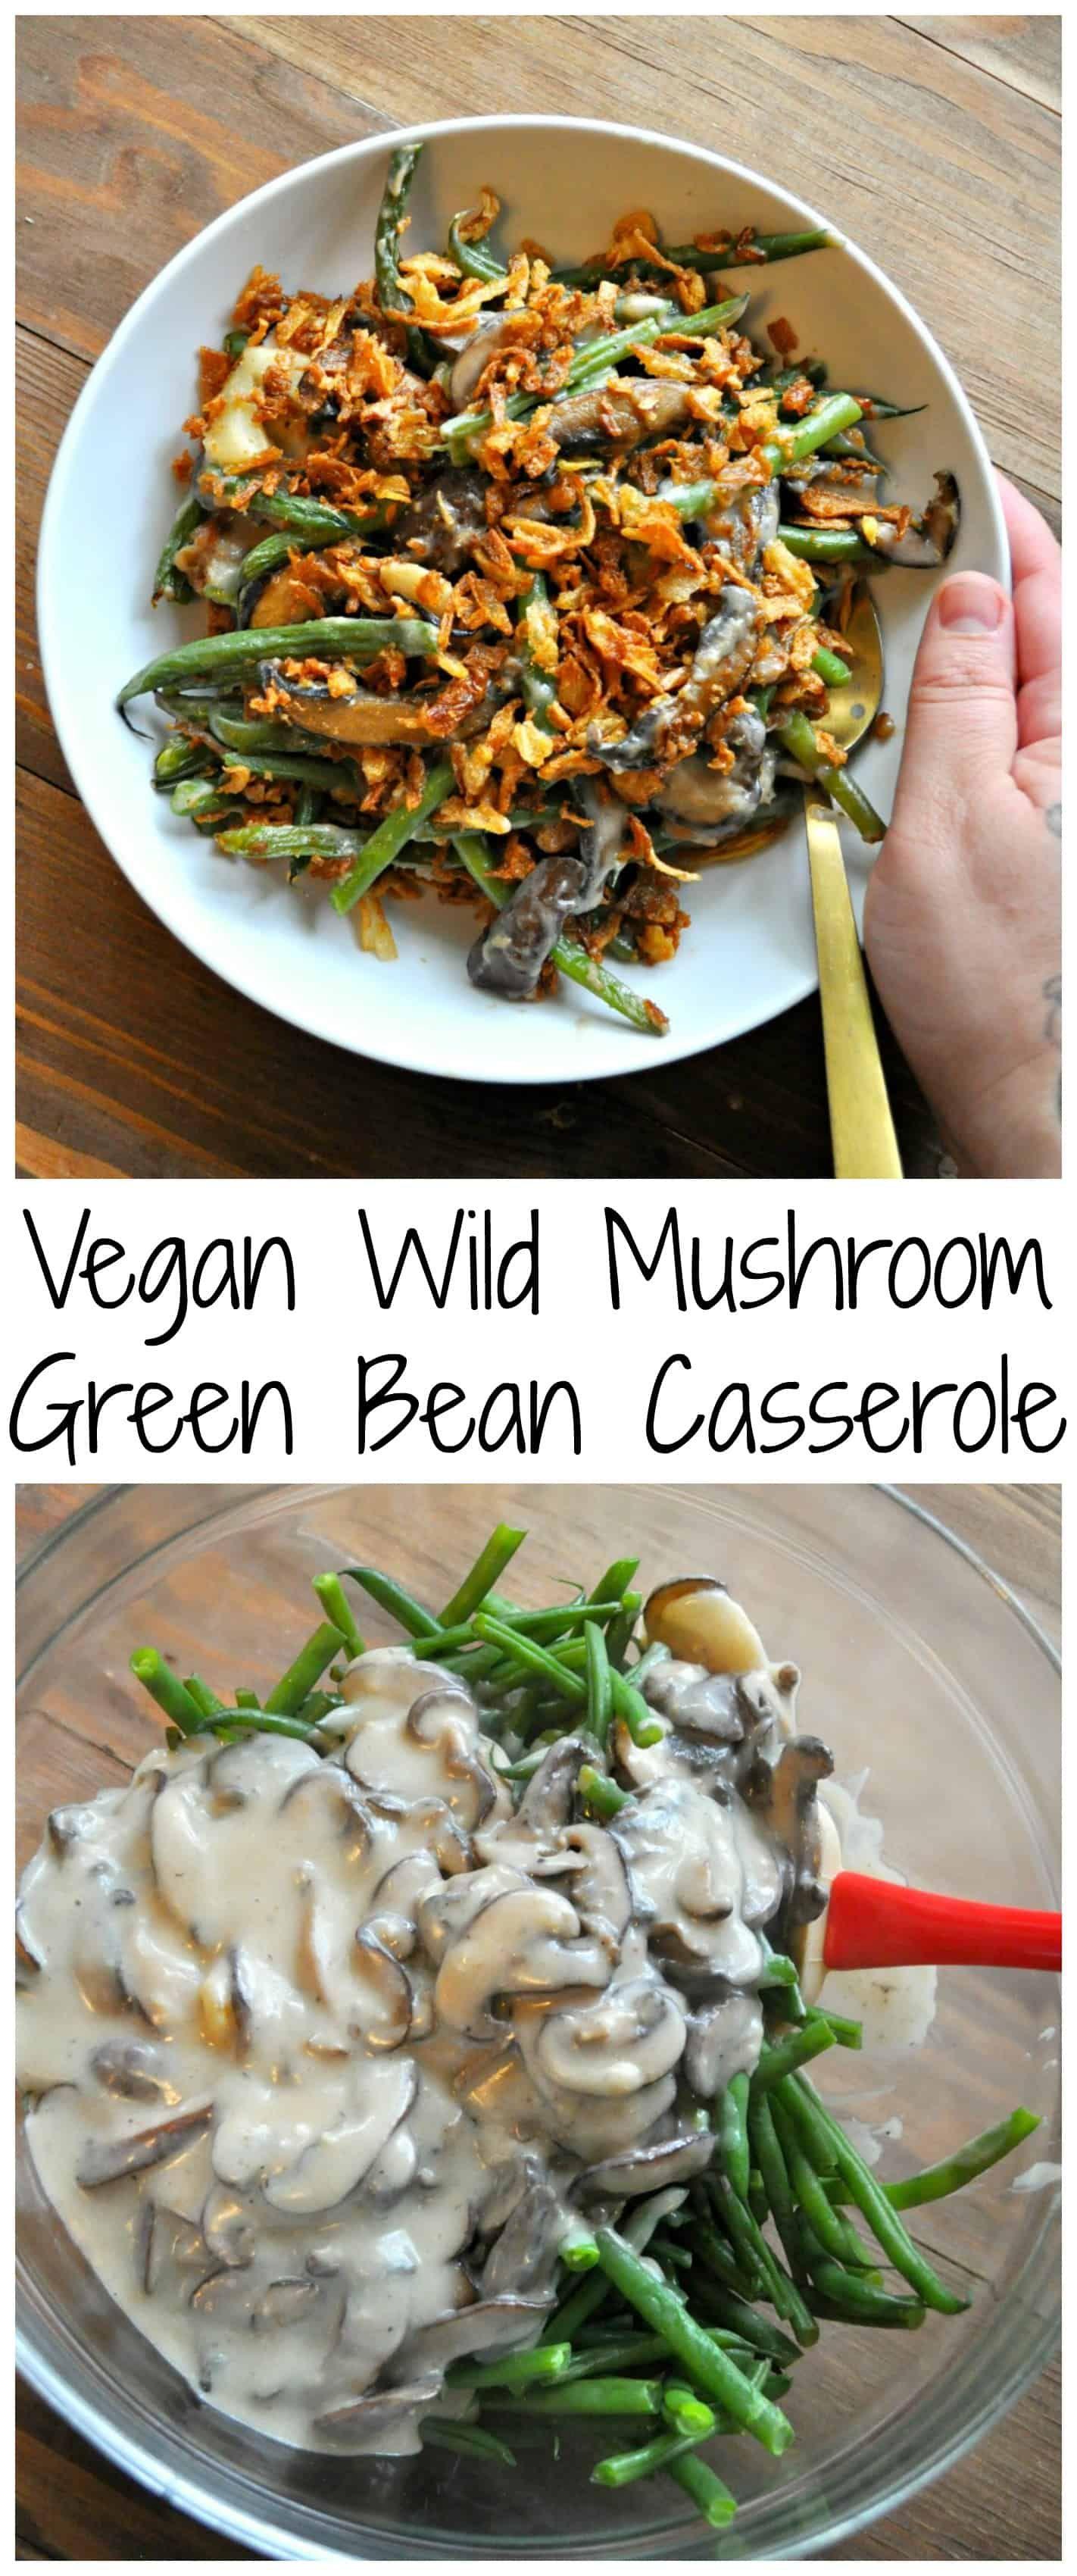 Wild Mushroom Vegan Green Bean Casserole - Rabbit and Wolves